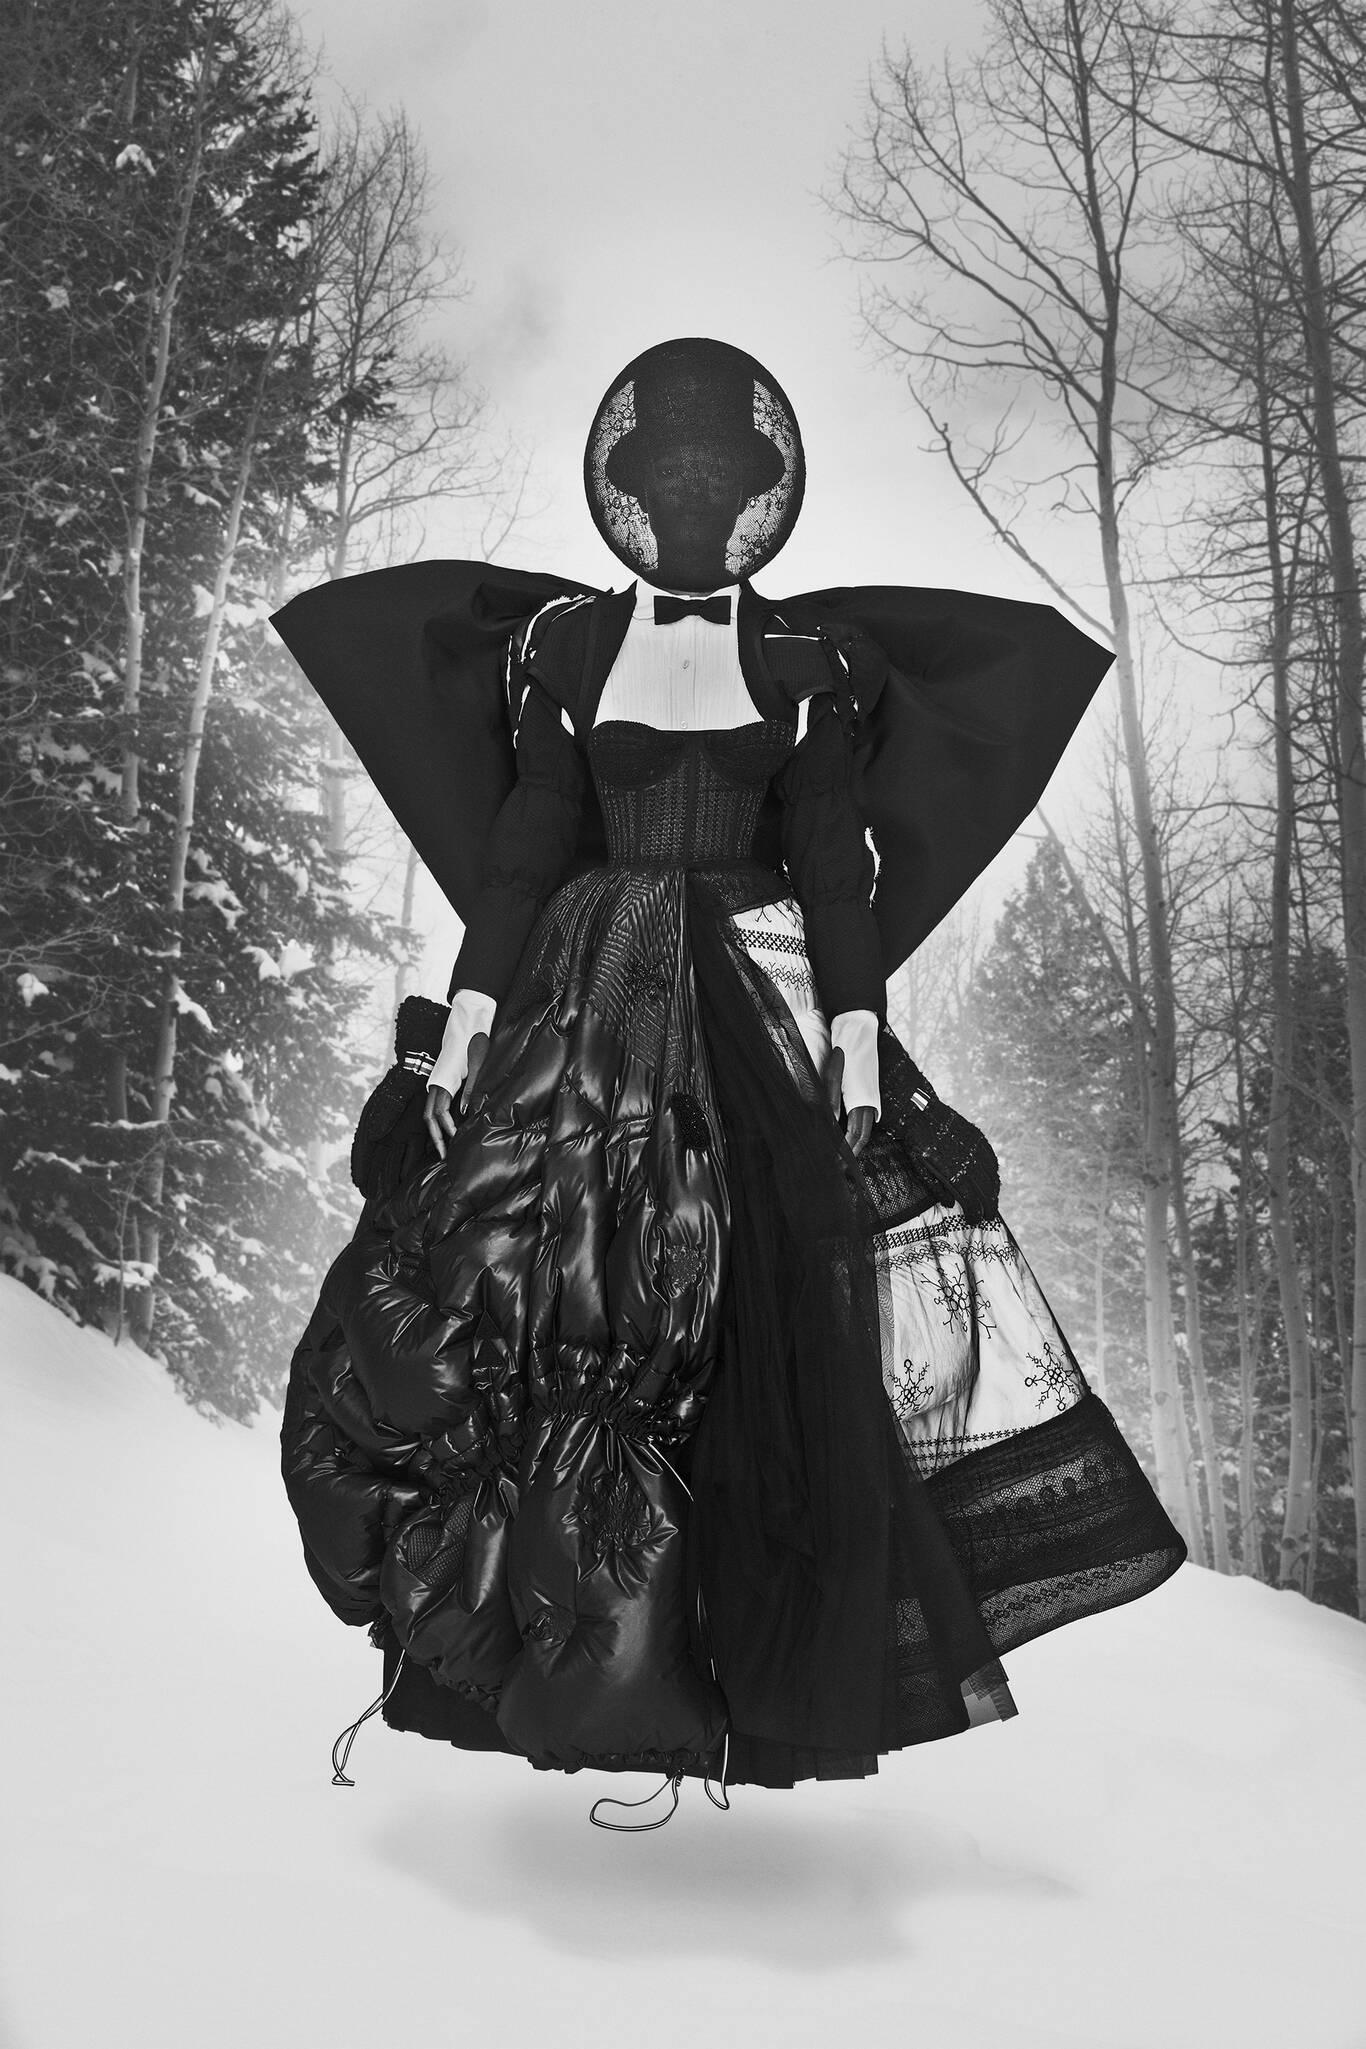 paris-fashion-week-2021-aw-fall-winter-2021